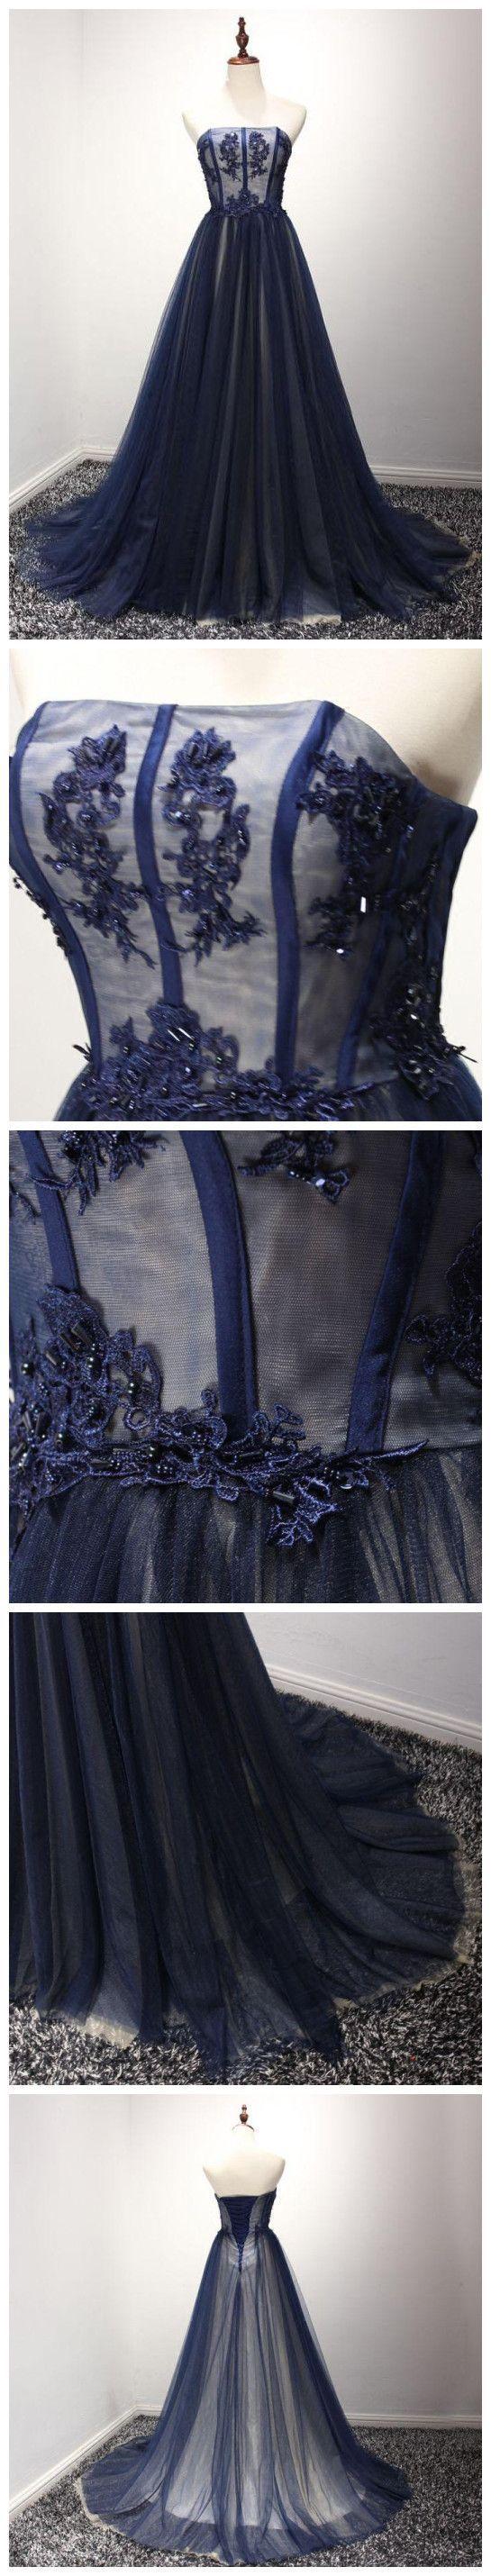 Stunning prom dress navy blue prom evening dressball gown prom